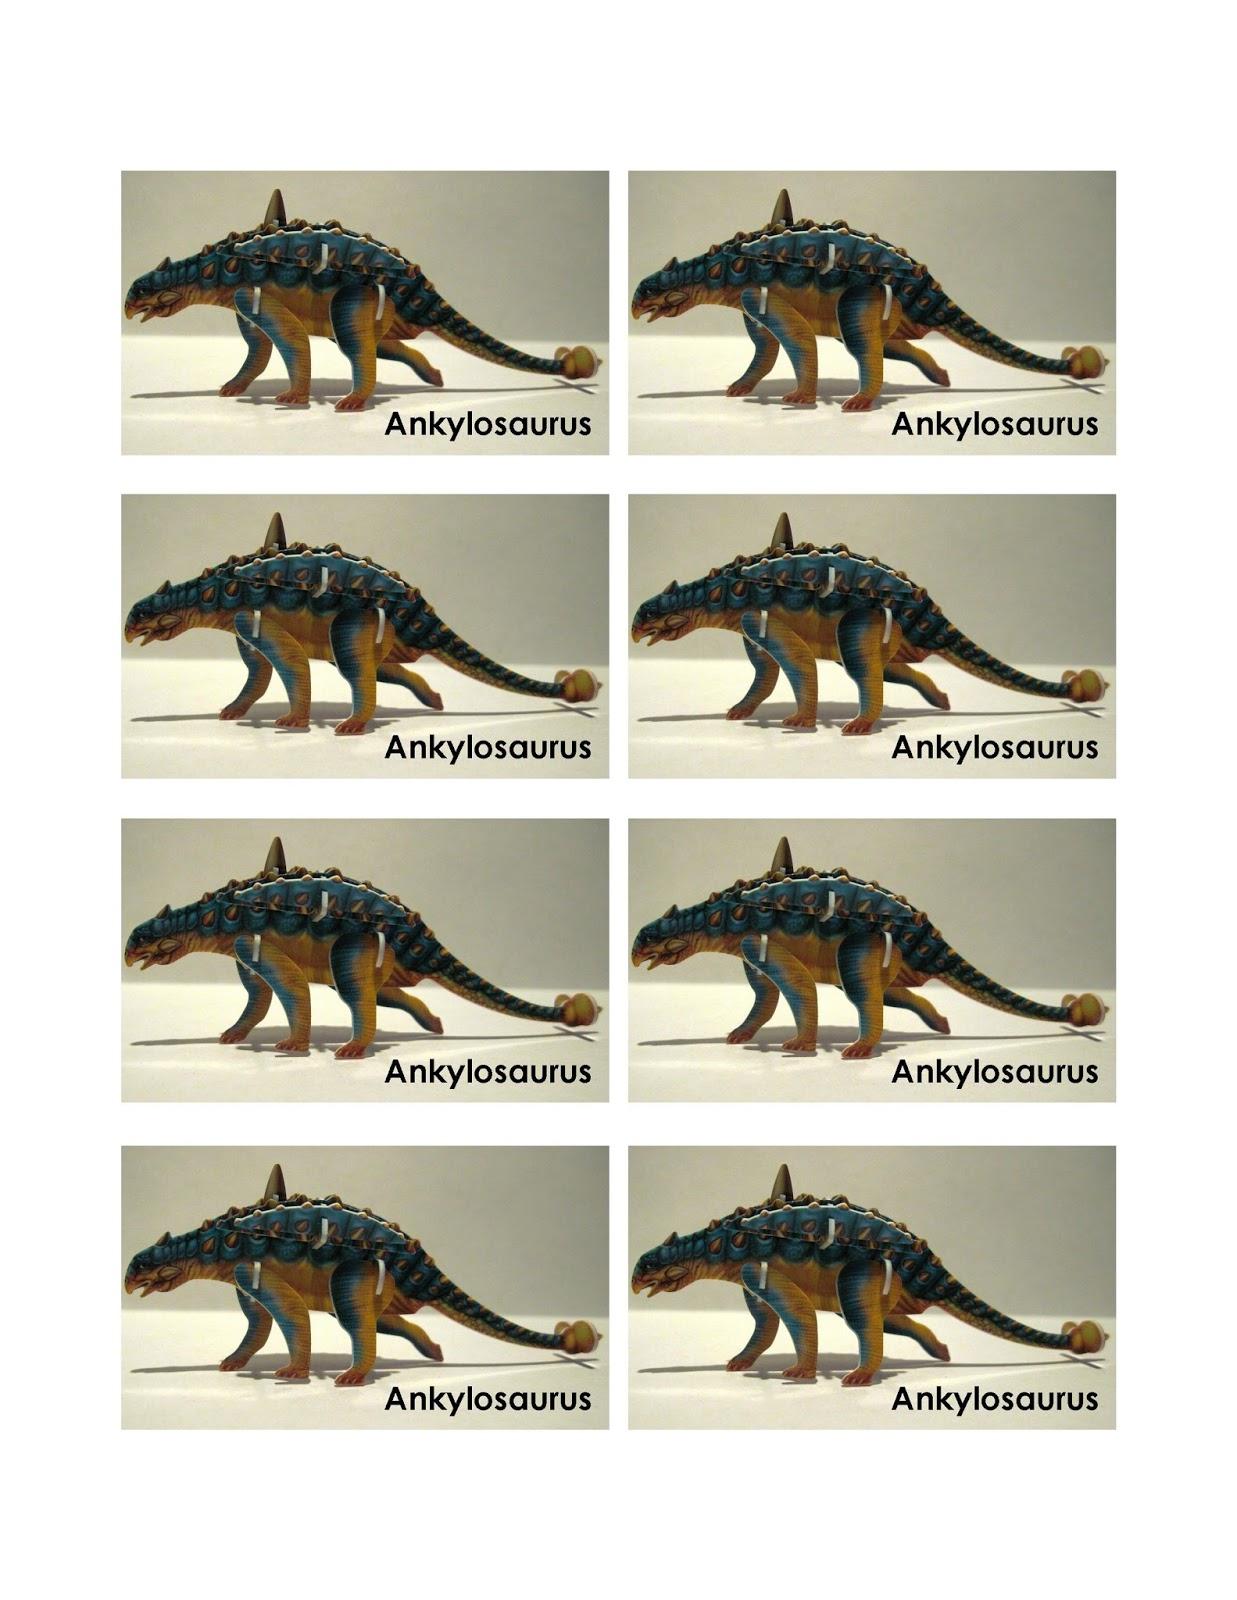 Simply Shoeboxes: Printable Instructions For Building 3D Dinosaur - Printable 3D Puzzles